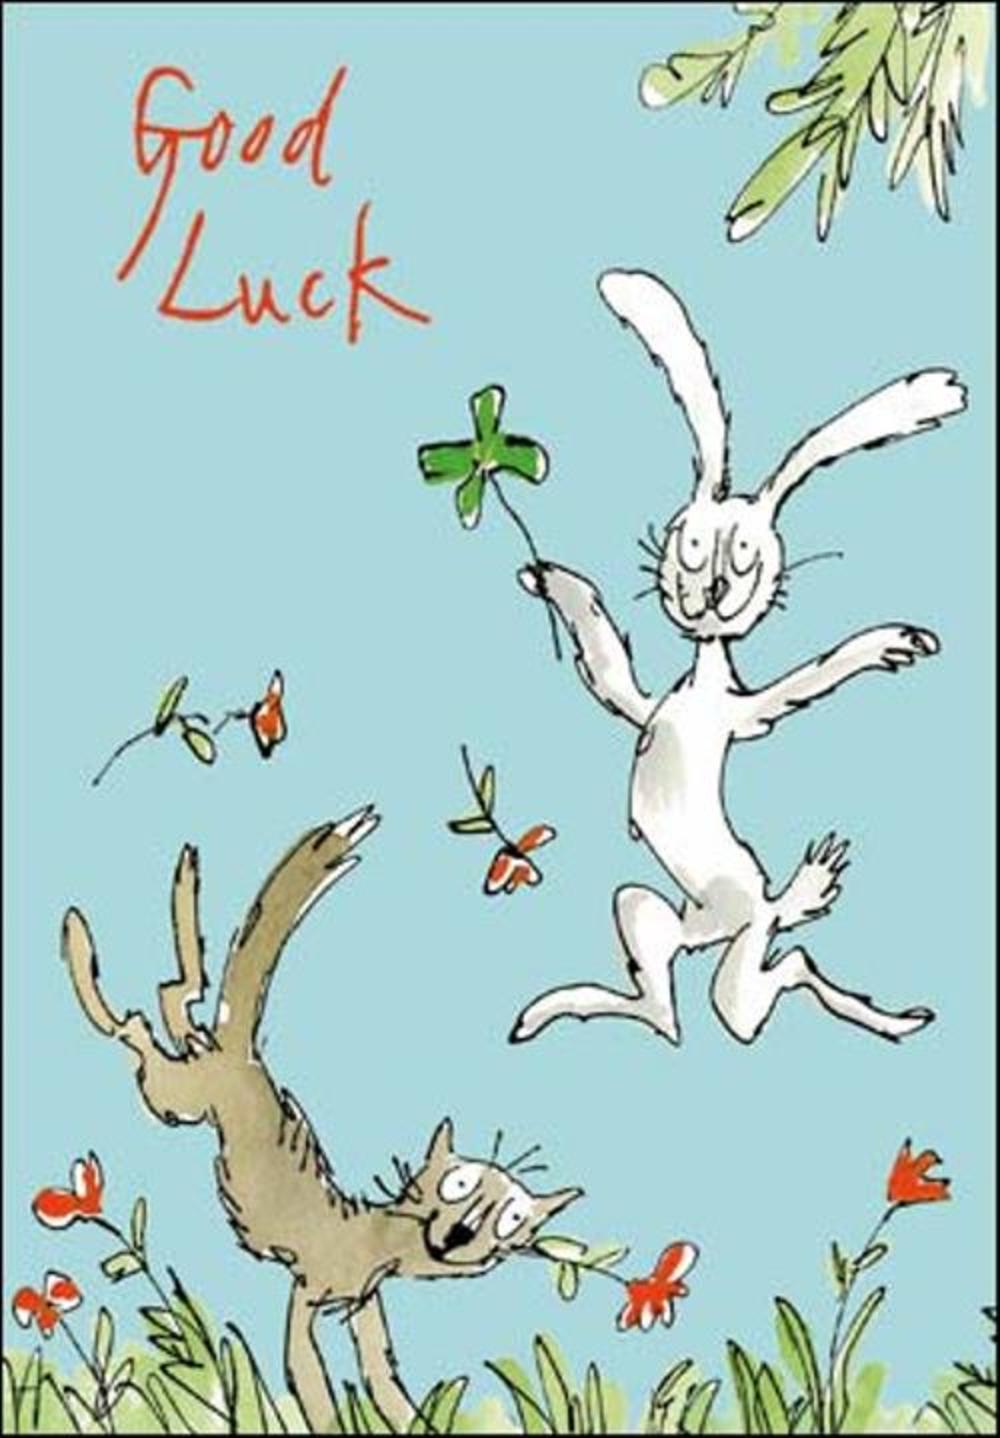 Quentin Blake Good Luck Greeting Card